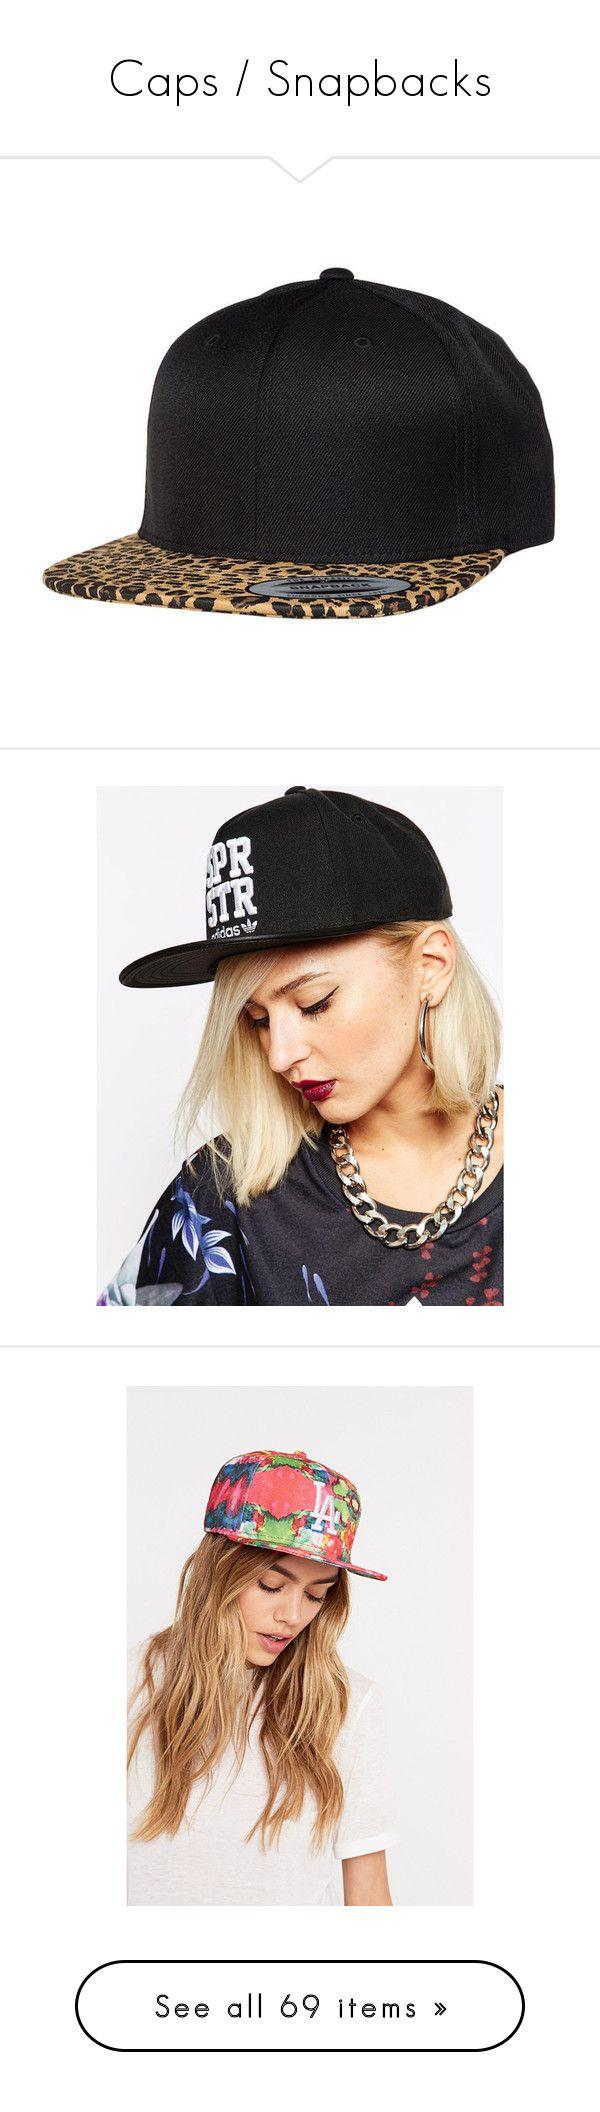 """Caps / Snapbacks"" by lisi-860 ❤ liked on Polyvore featuring accessories, hats, snapbacks, head, black, flexfit snapback, leopard print cap, animal print snapback hats, leopard print snapback and leopard print hats"